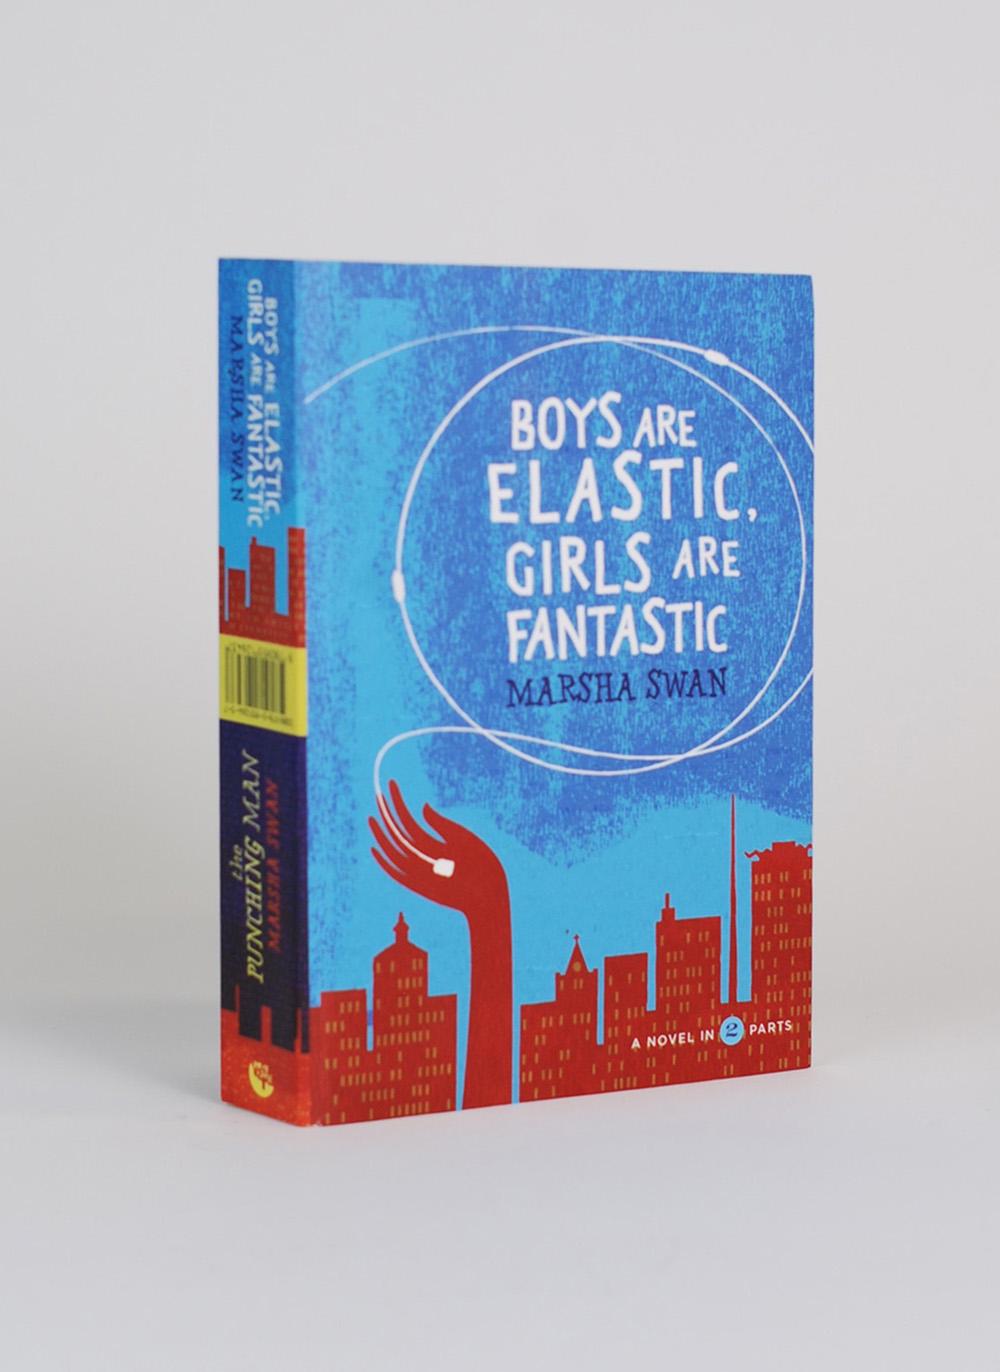 Boys are Elastic, Girls are Fantastic